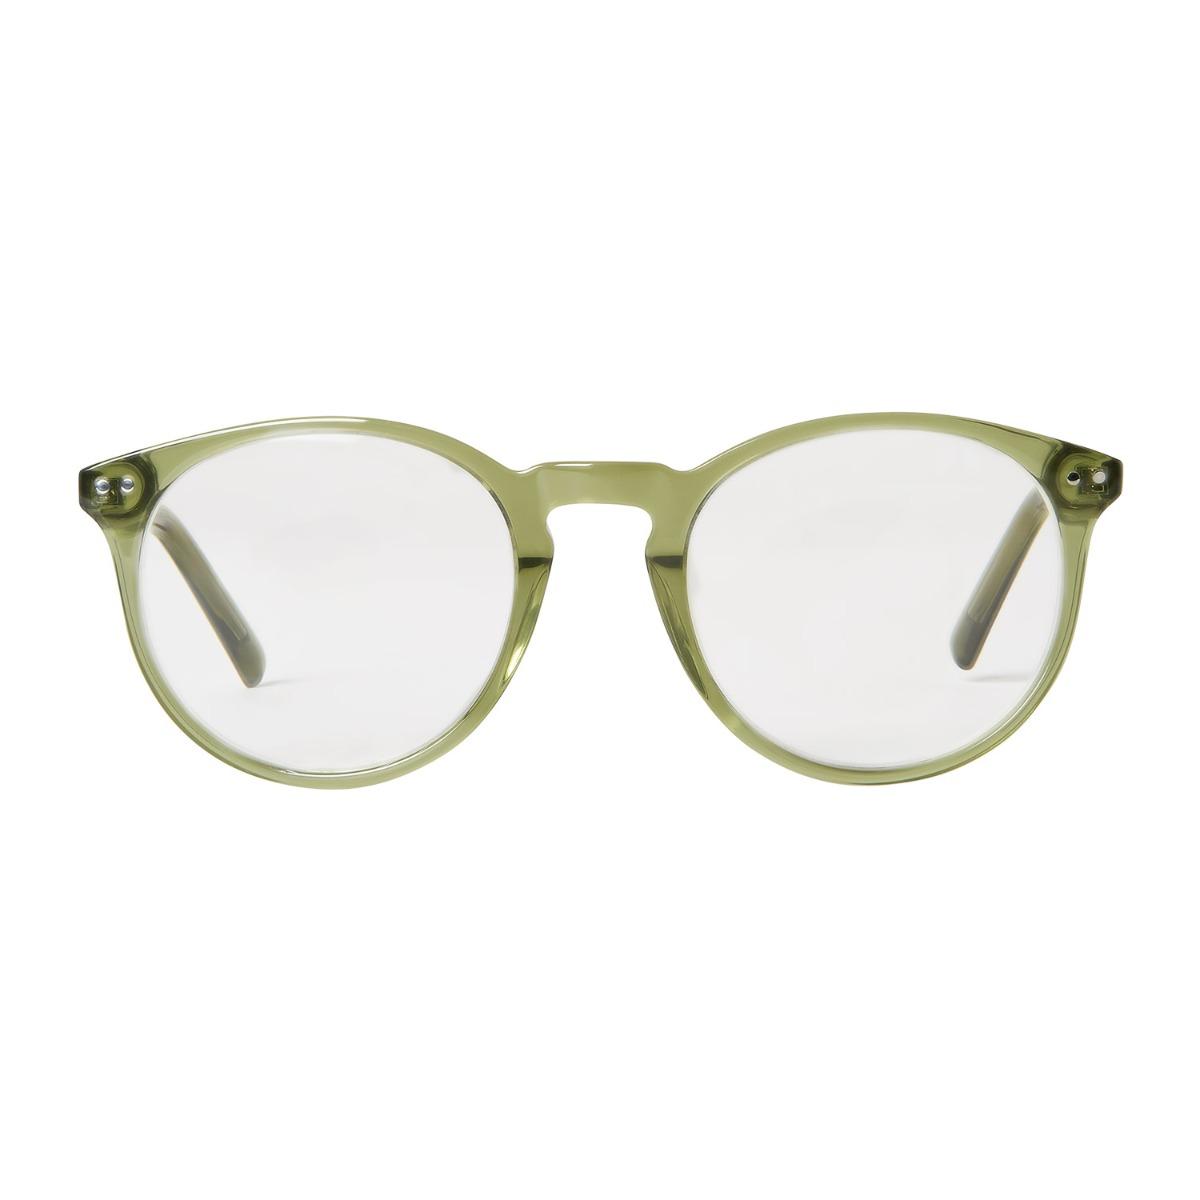 Designtorget Läsglasögon DT Rund Grön +1,5